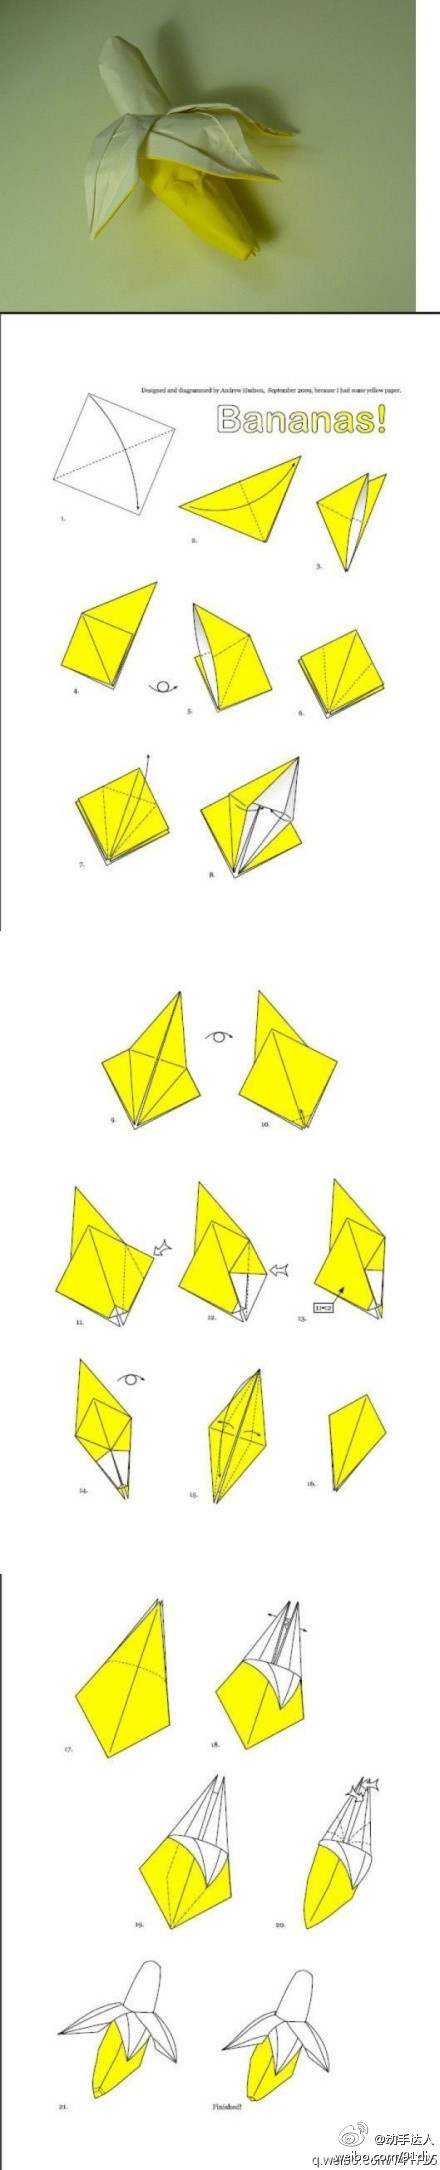 Origami 3D Banana